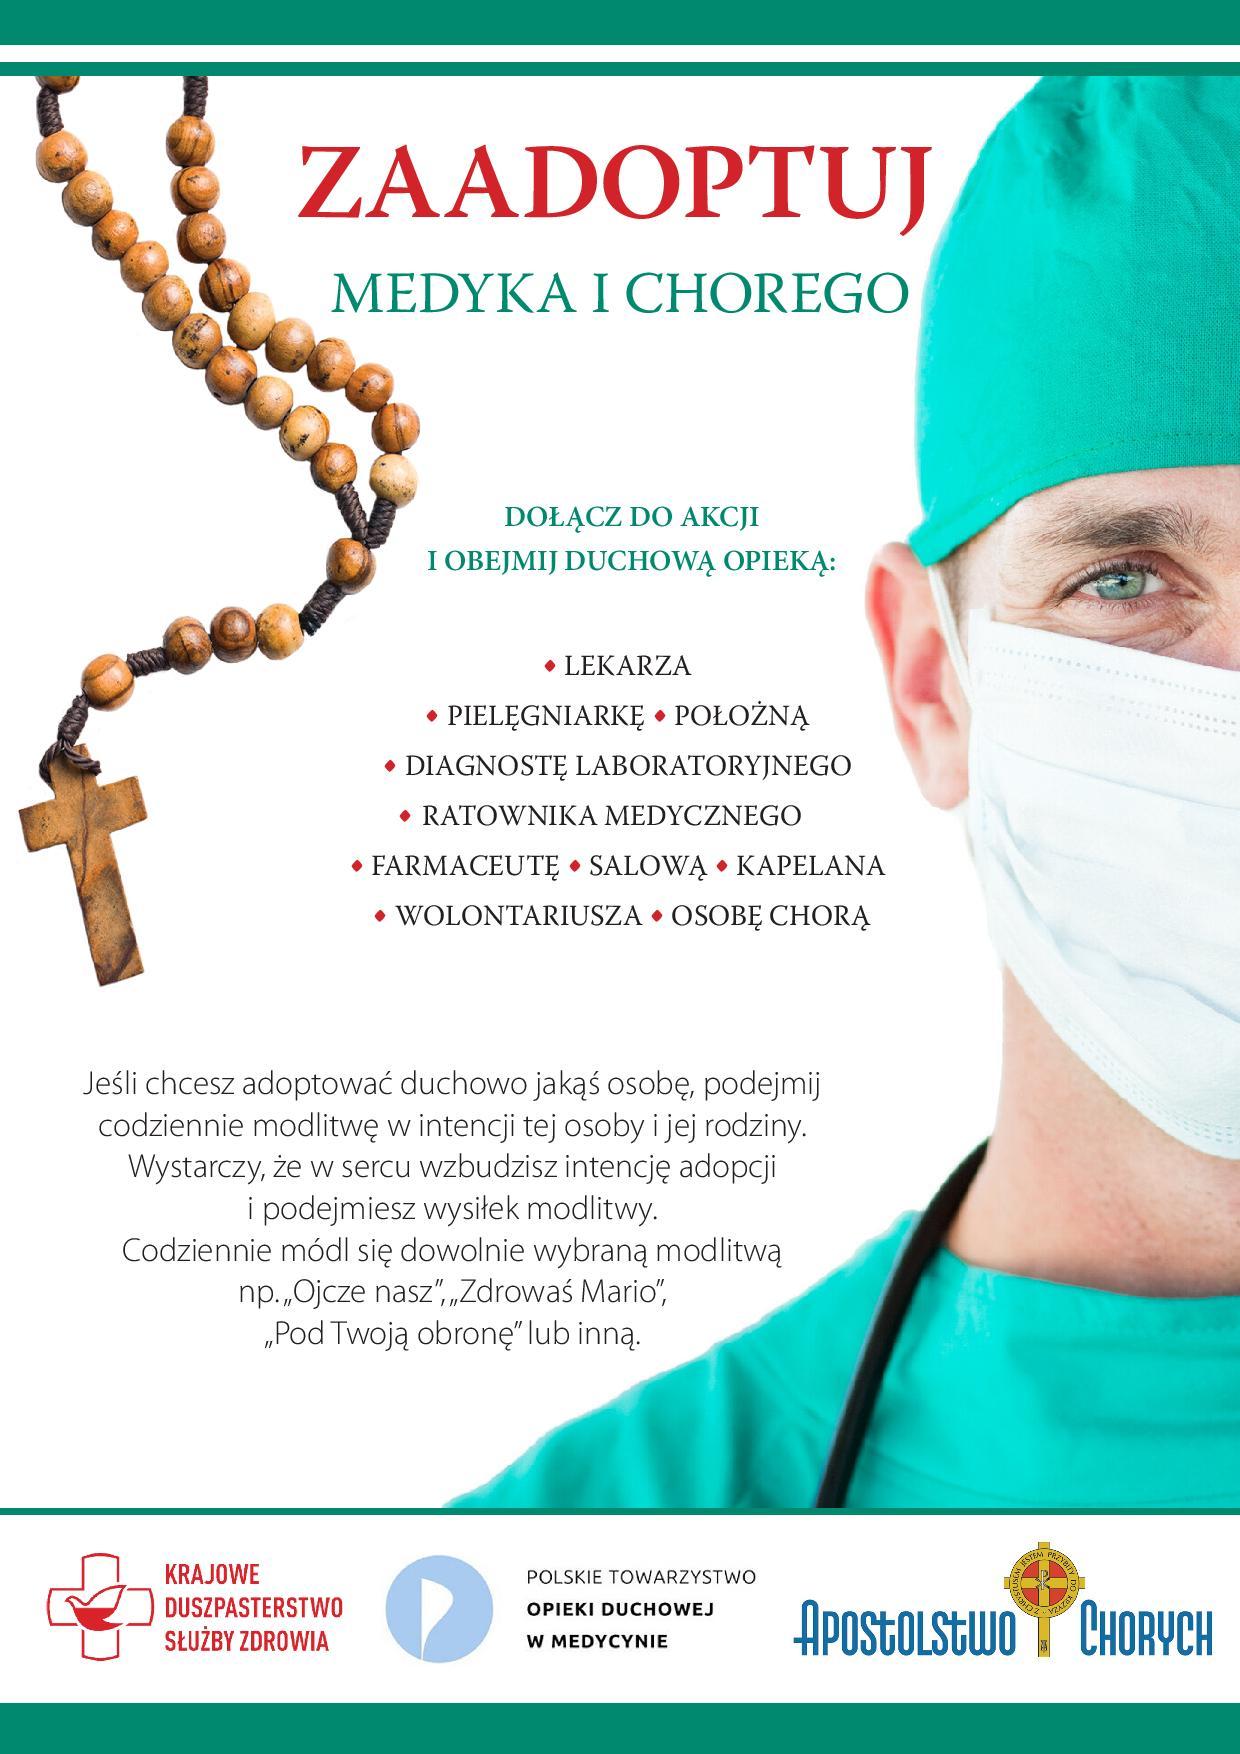 zaadoptuj-medyka